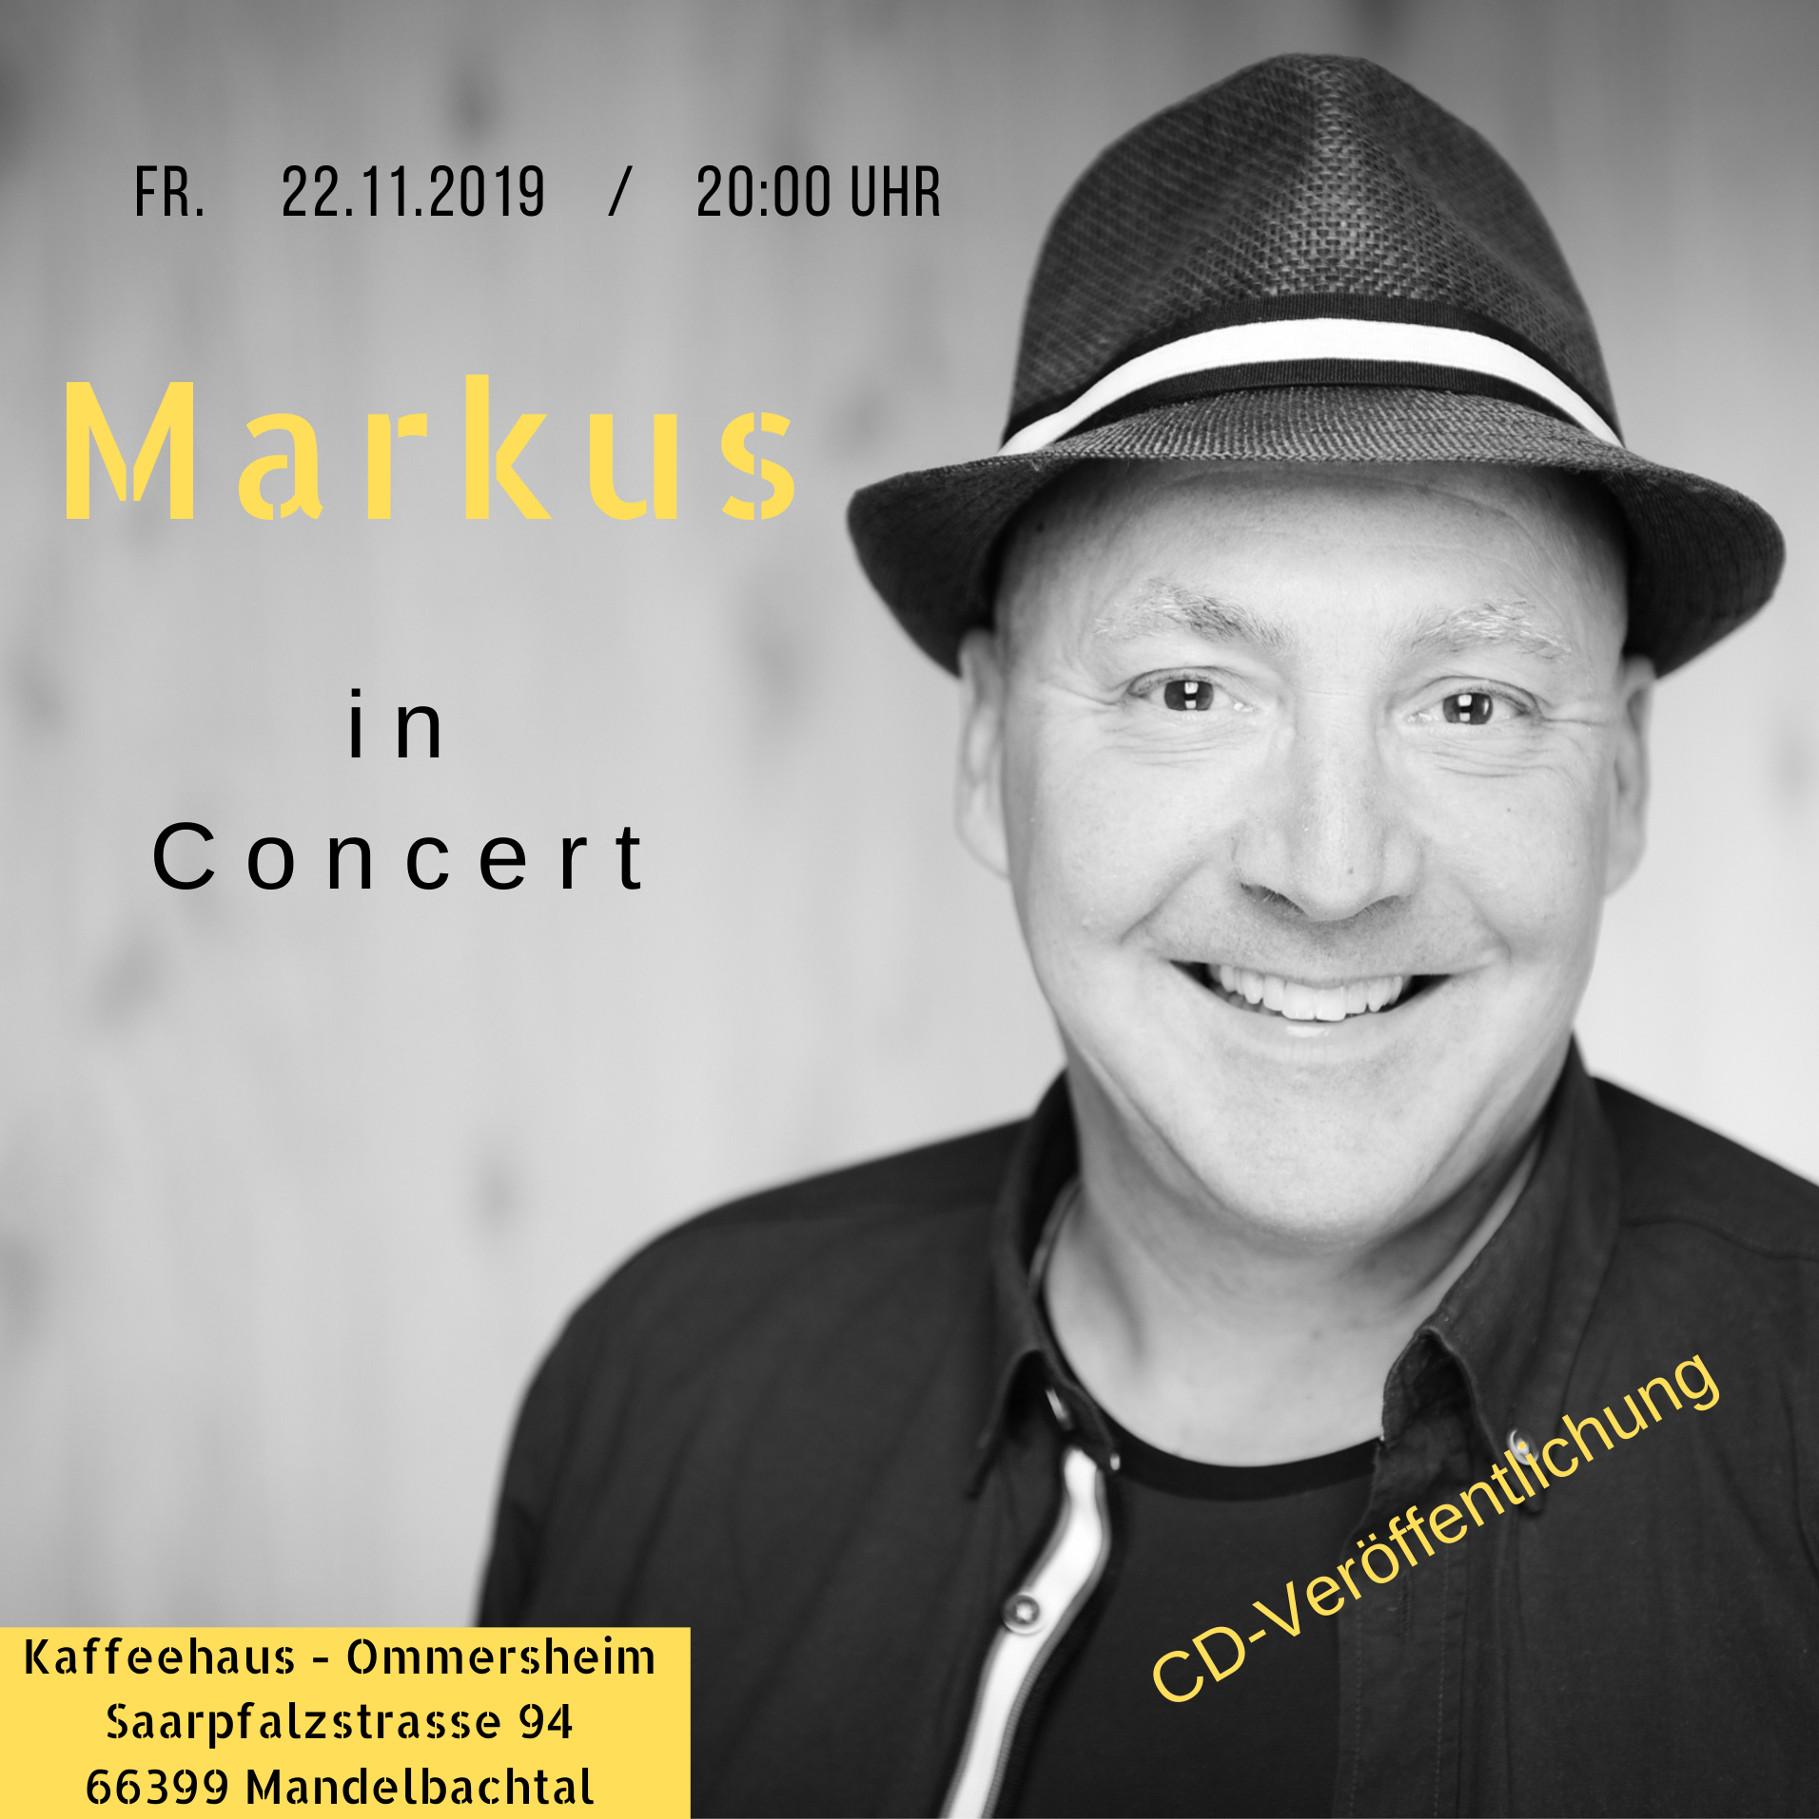 Markus 1 TOP